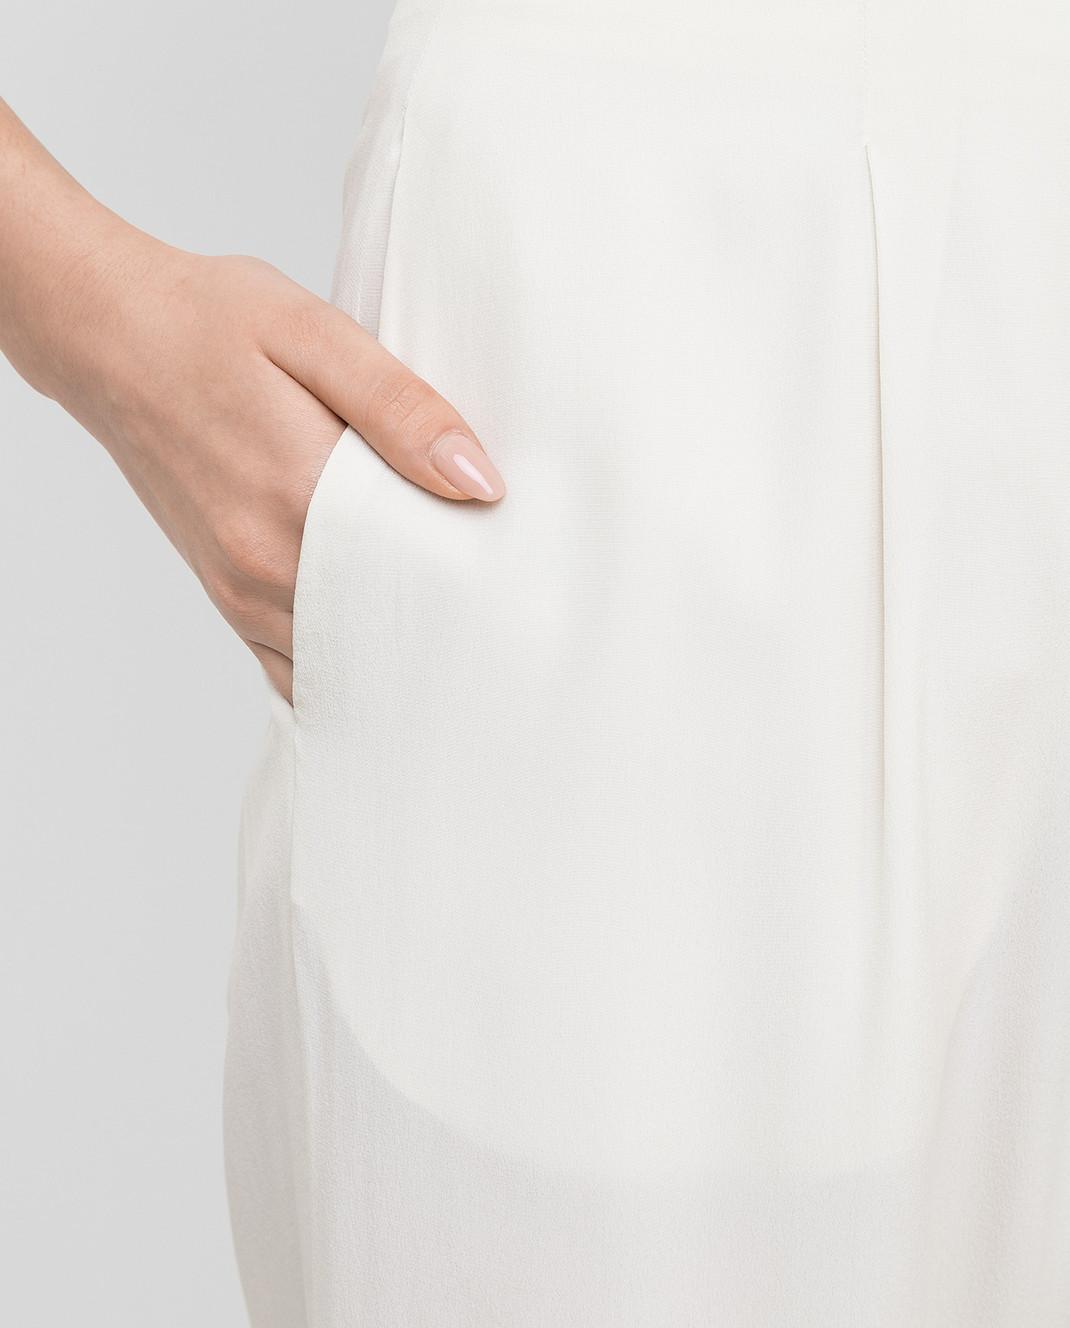 Marni Светло-бежевые брюки из шелка PAMAP01A00TSA29 изображение 5